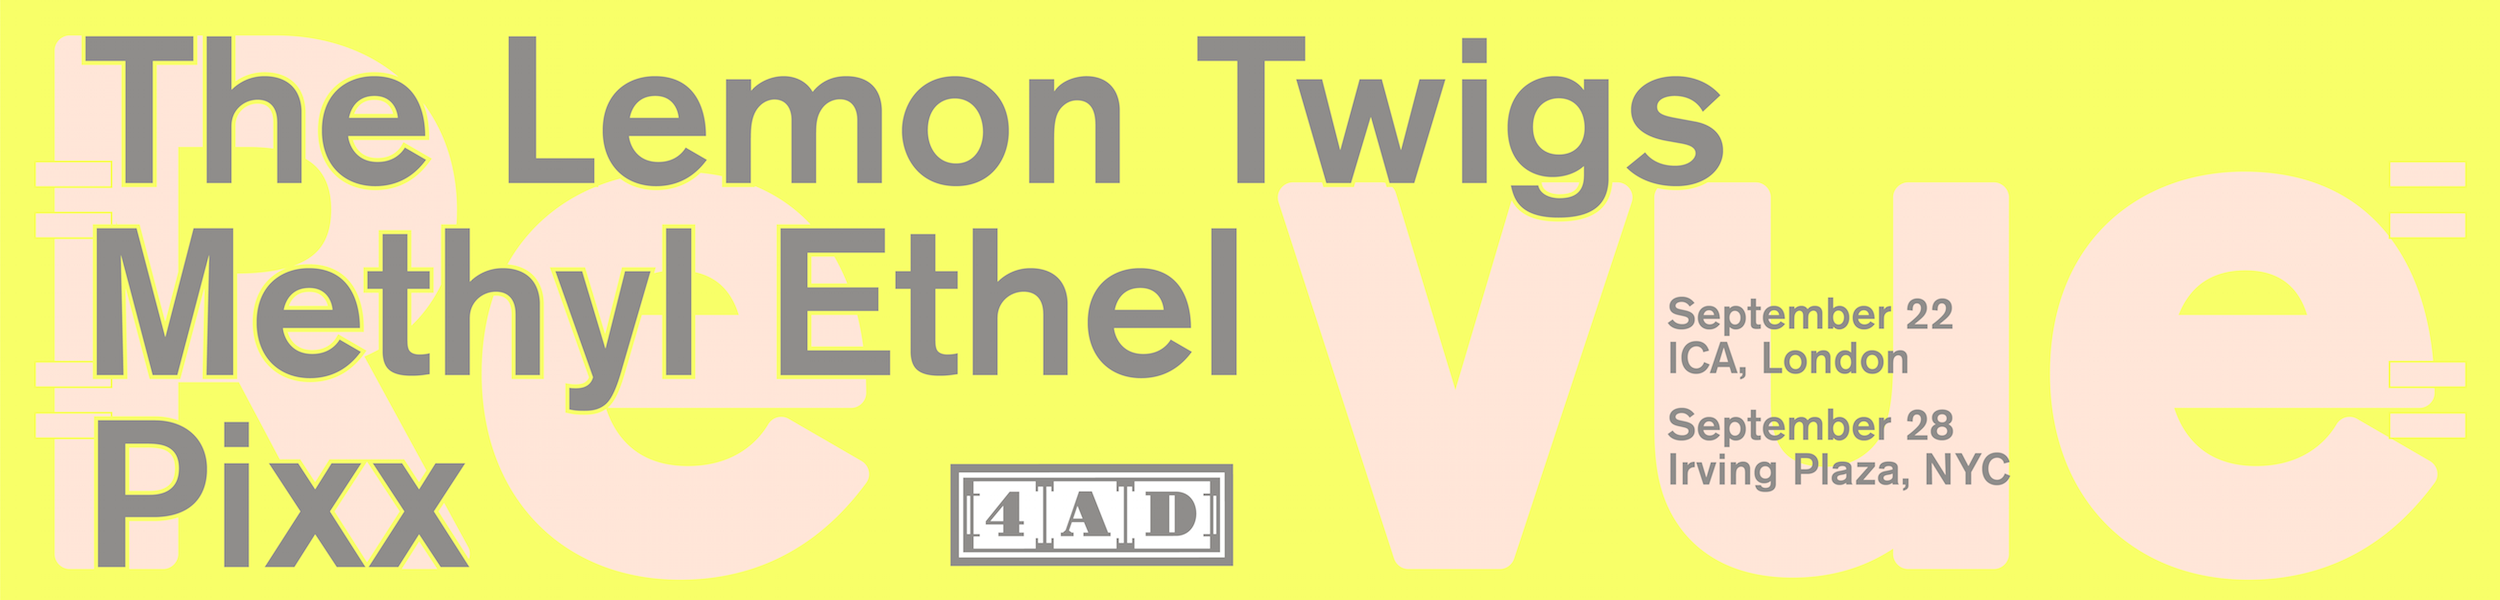 Various - 4AD Revue Shows, Featuring Methyl Ethel, The Lemon Twigs, Pixx